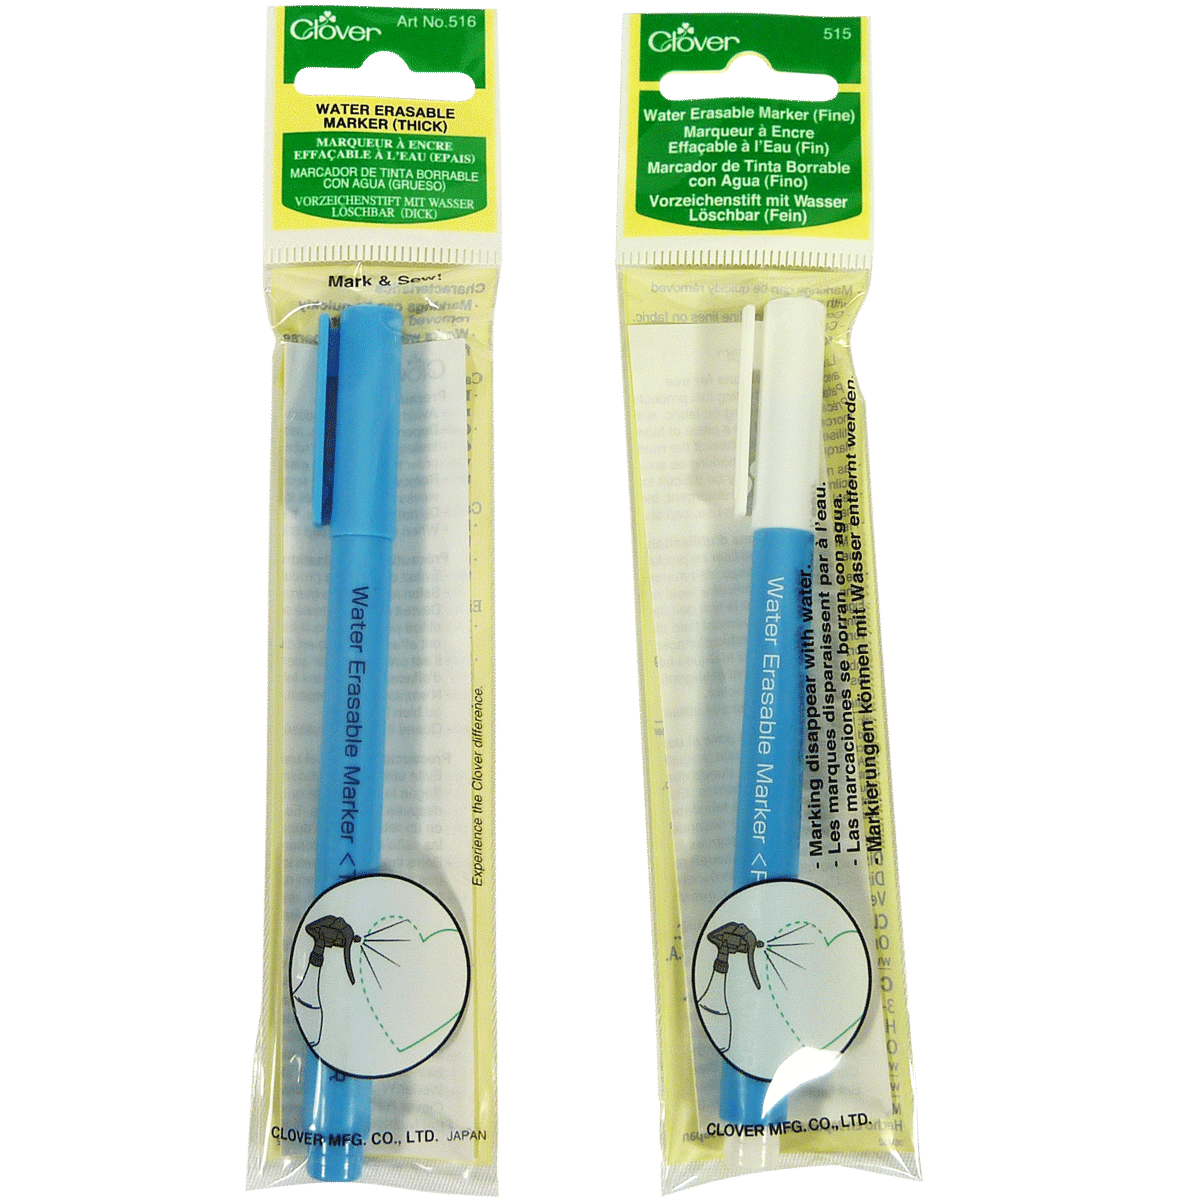 Water Erasable Marker